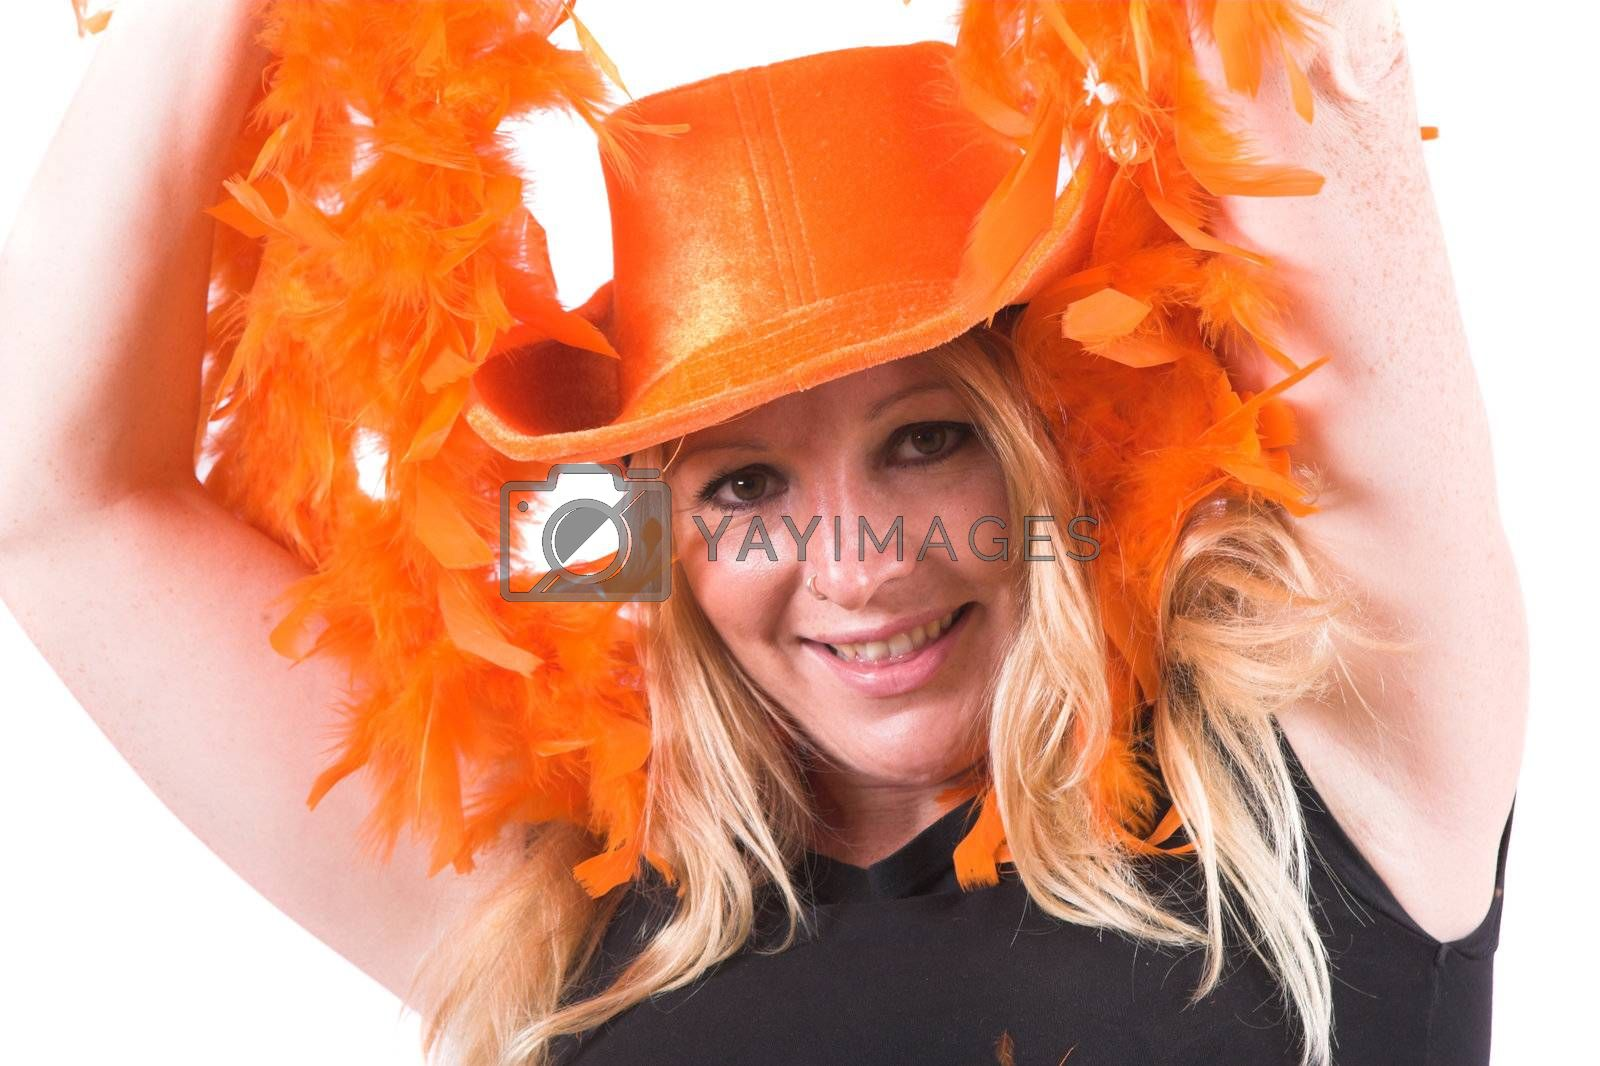 Pretty blond woman celebrating that her team has won